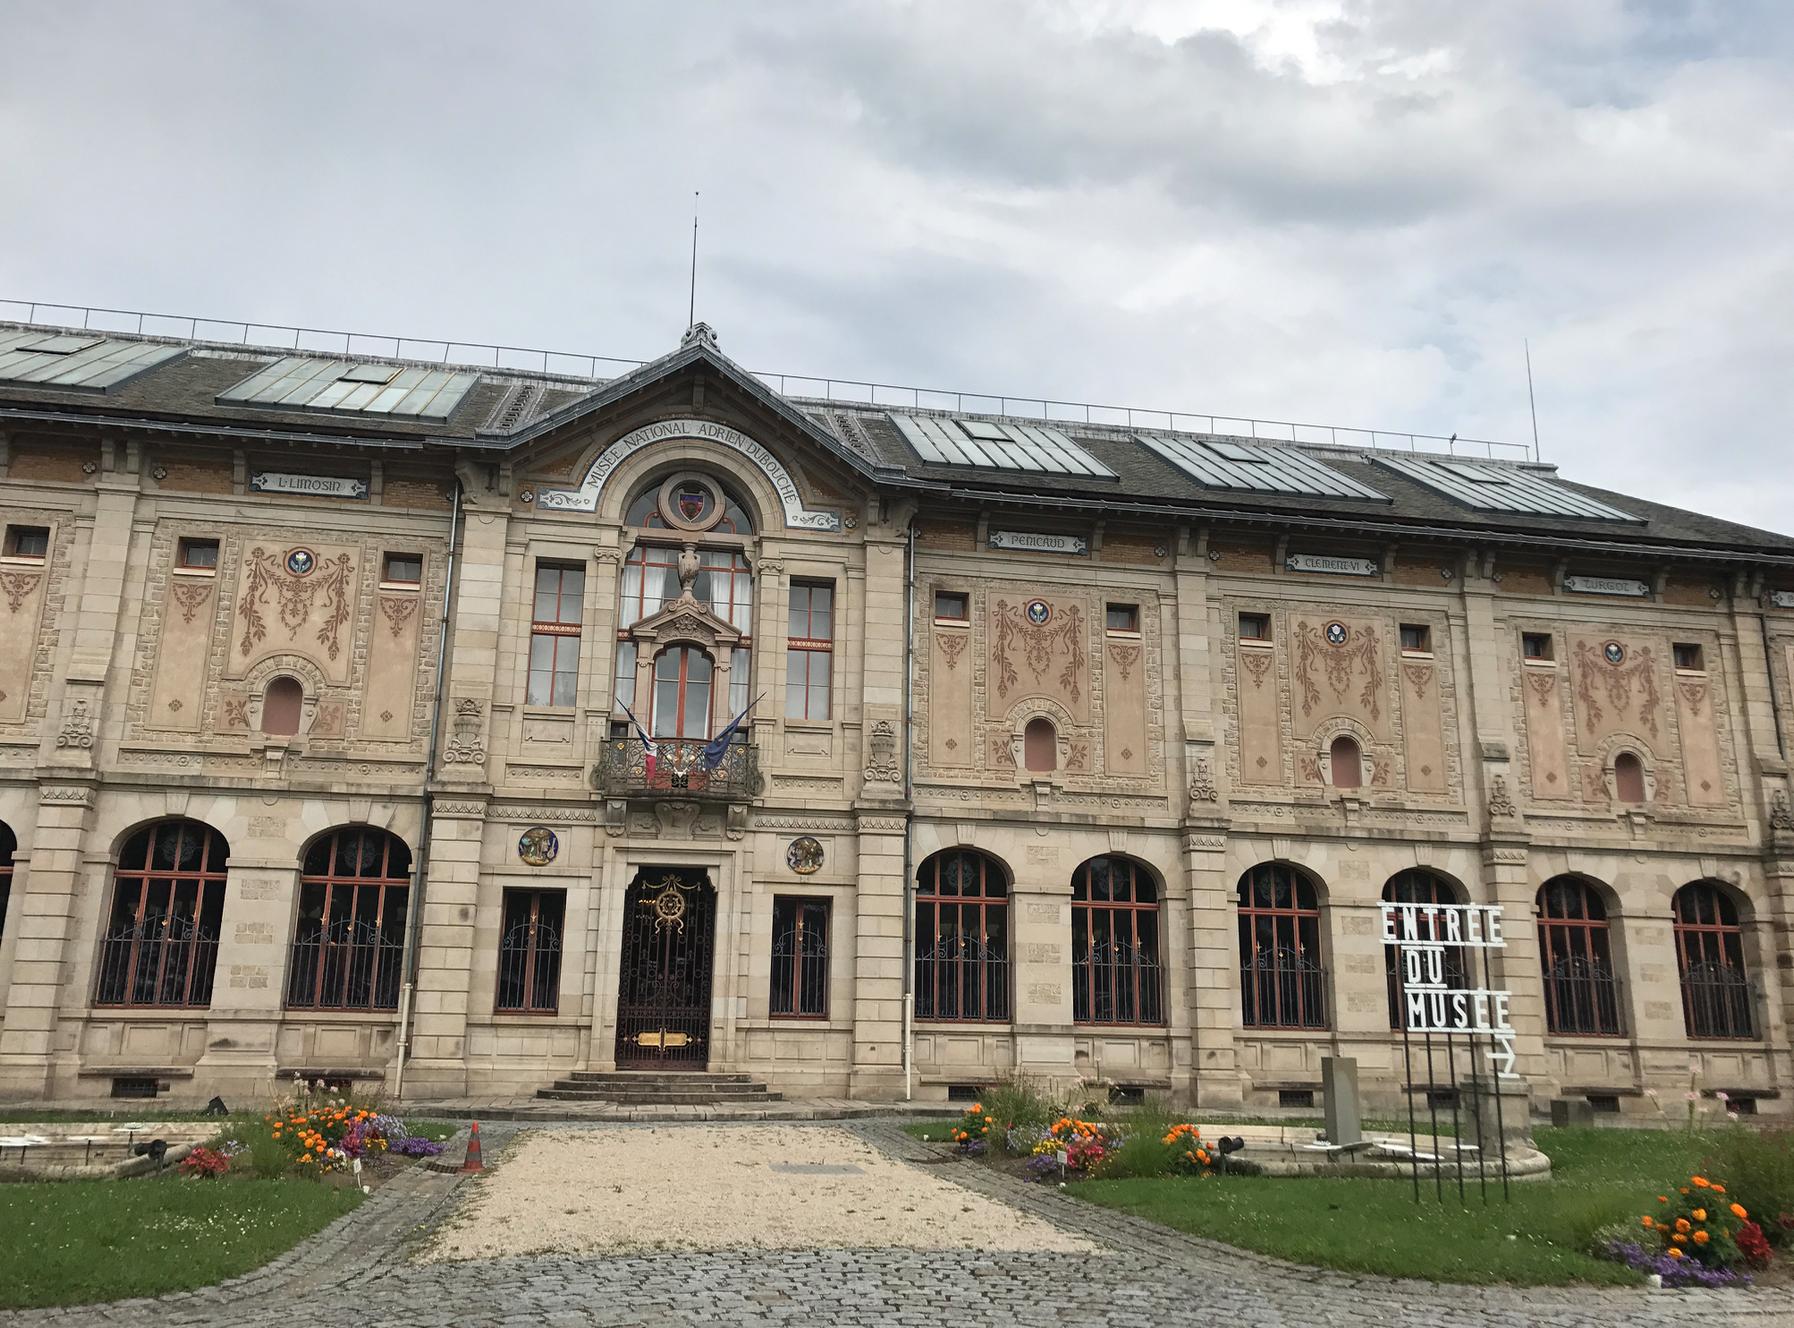 Musée de la céramique (chiens interdits)